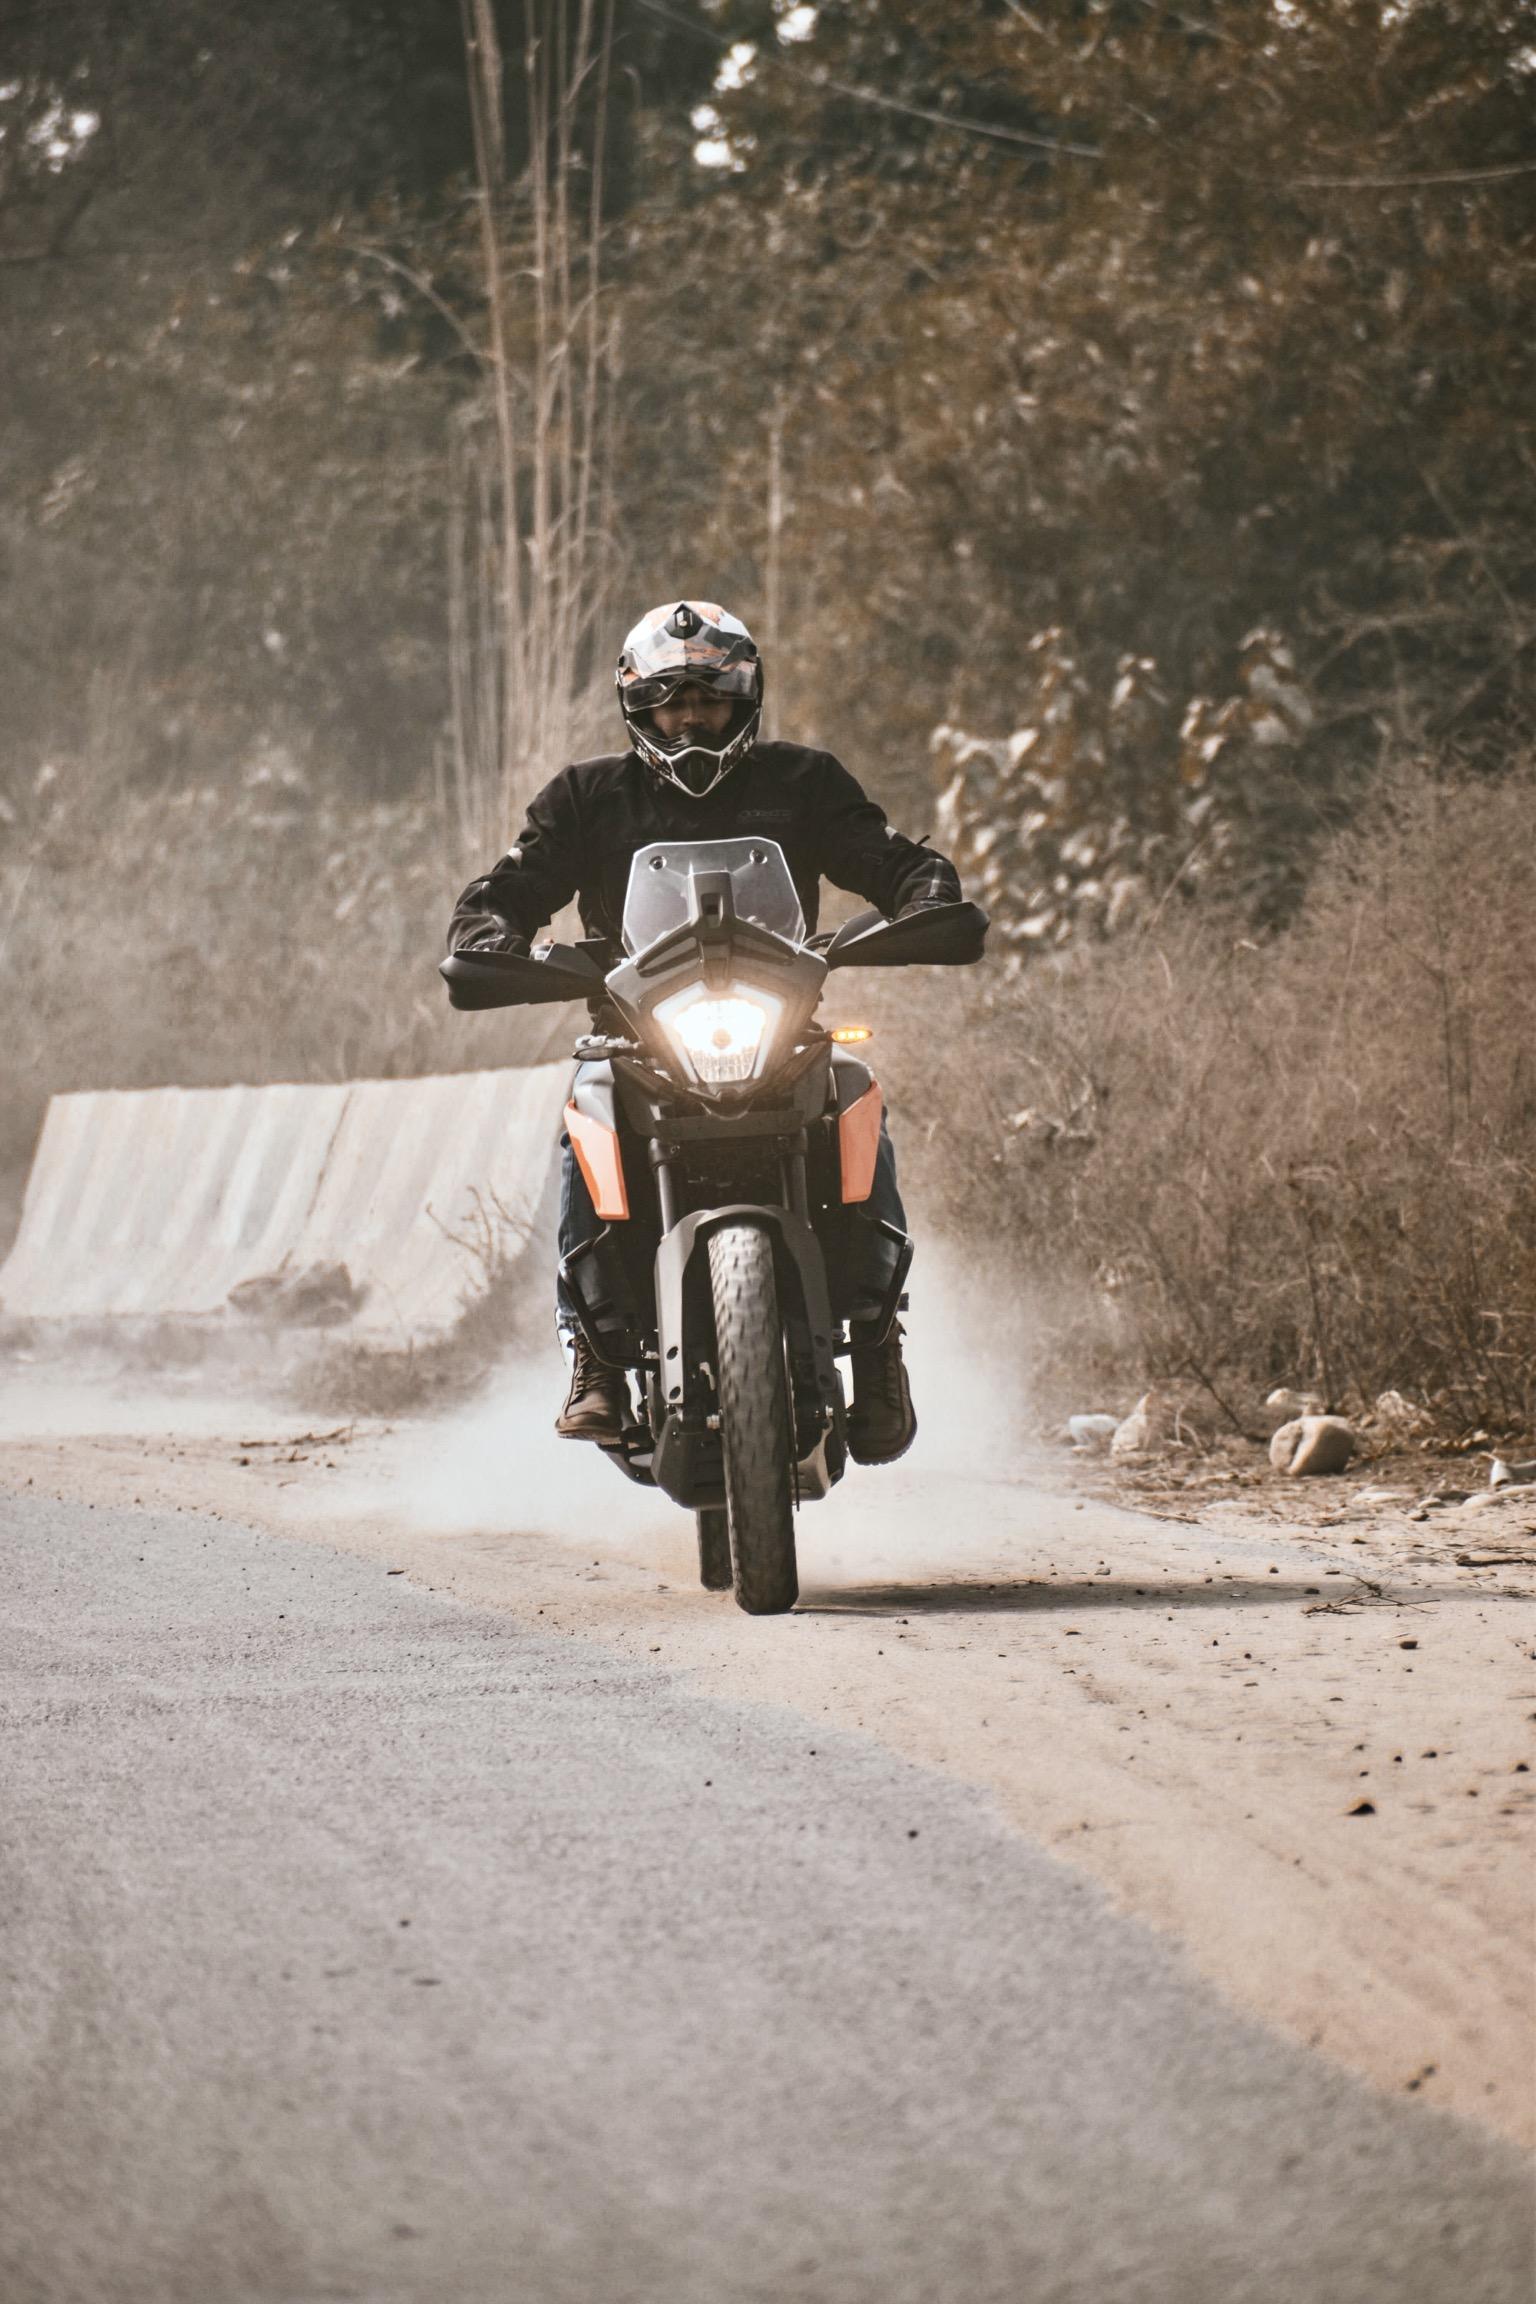 Man riding KTM bike on road